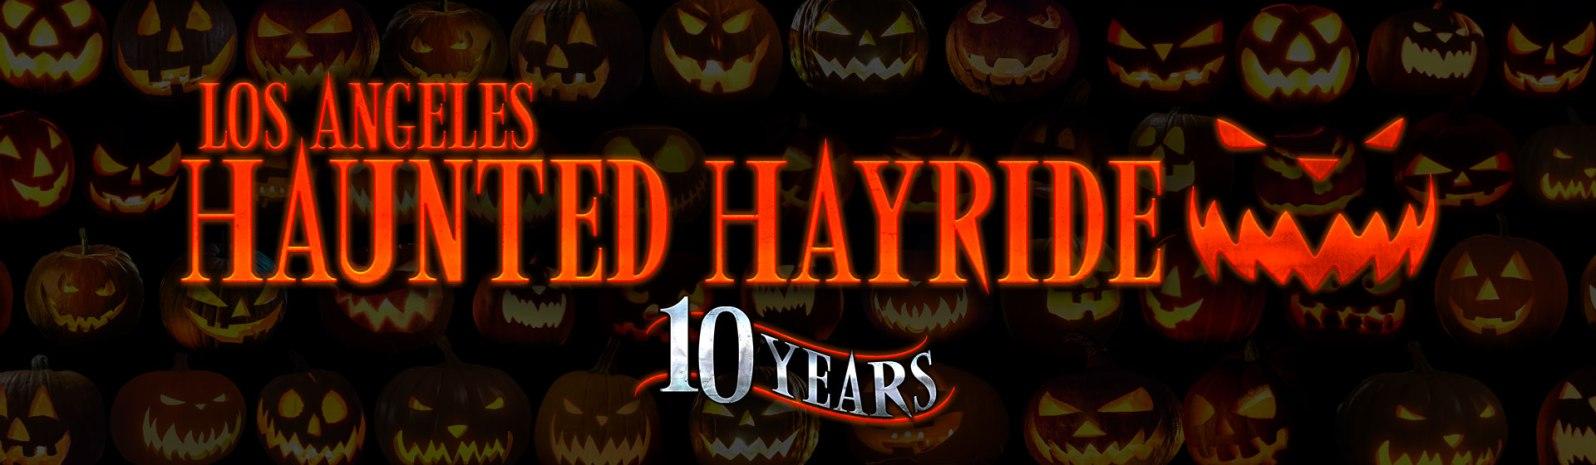 la-haunted-hayride-10-year-blowout-banner